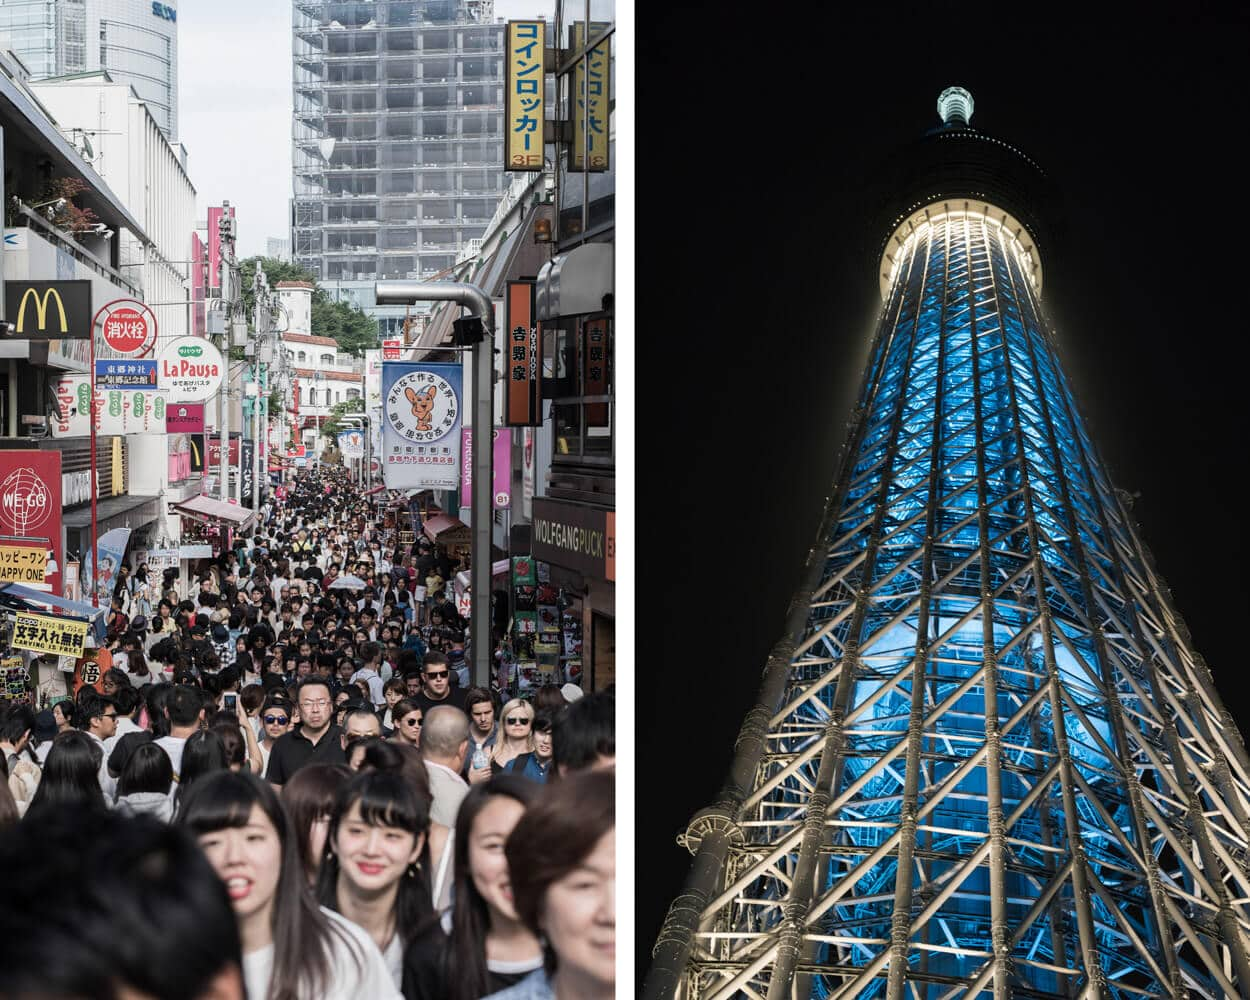 Takeashite Street and Tokyo Skytree Tower